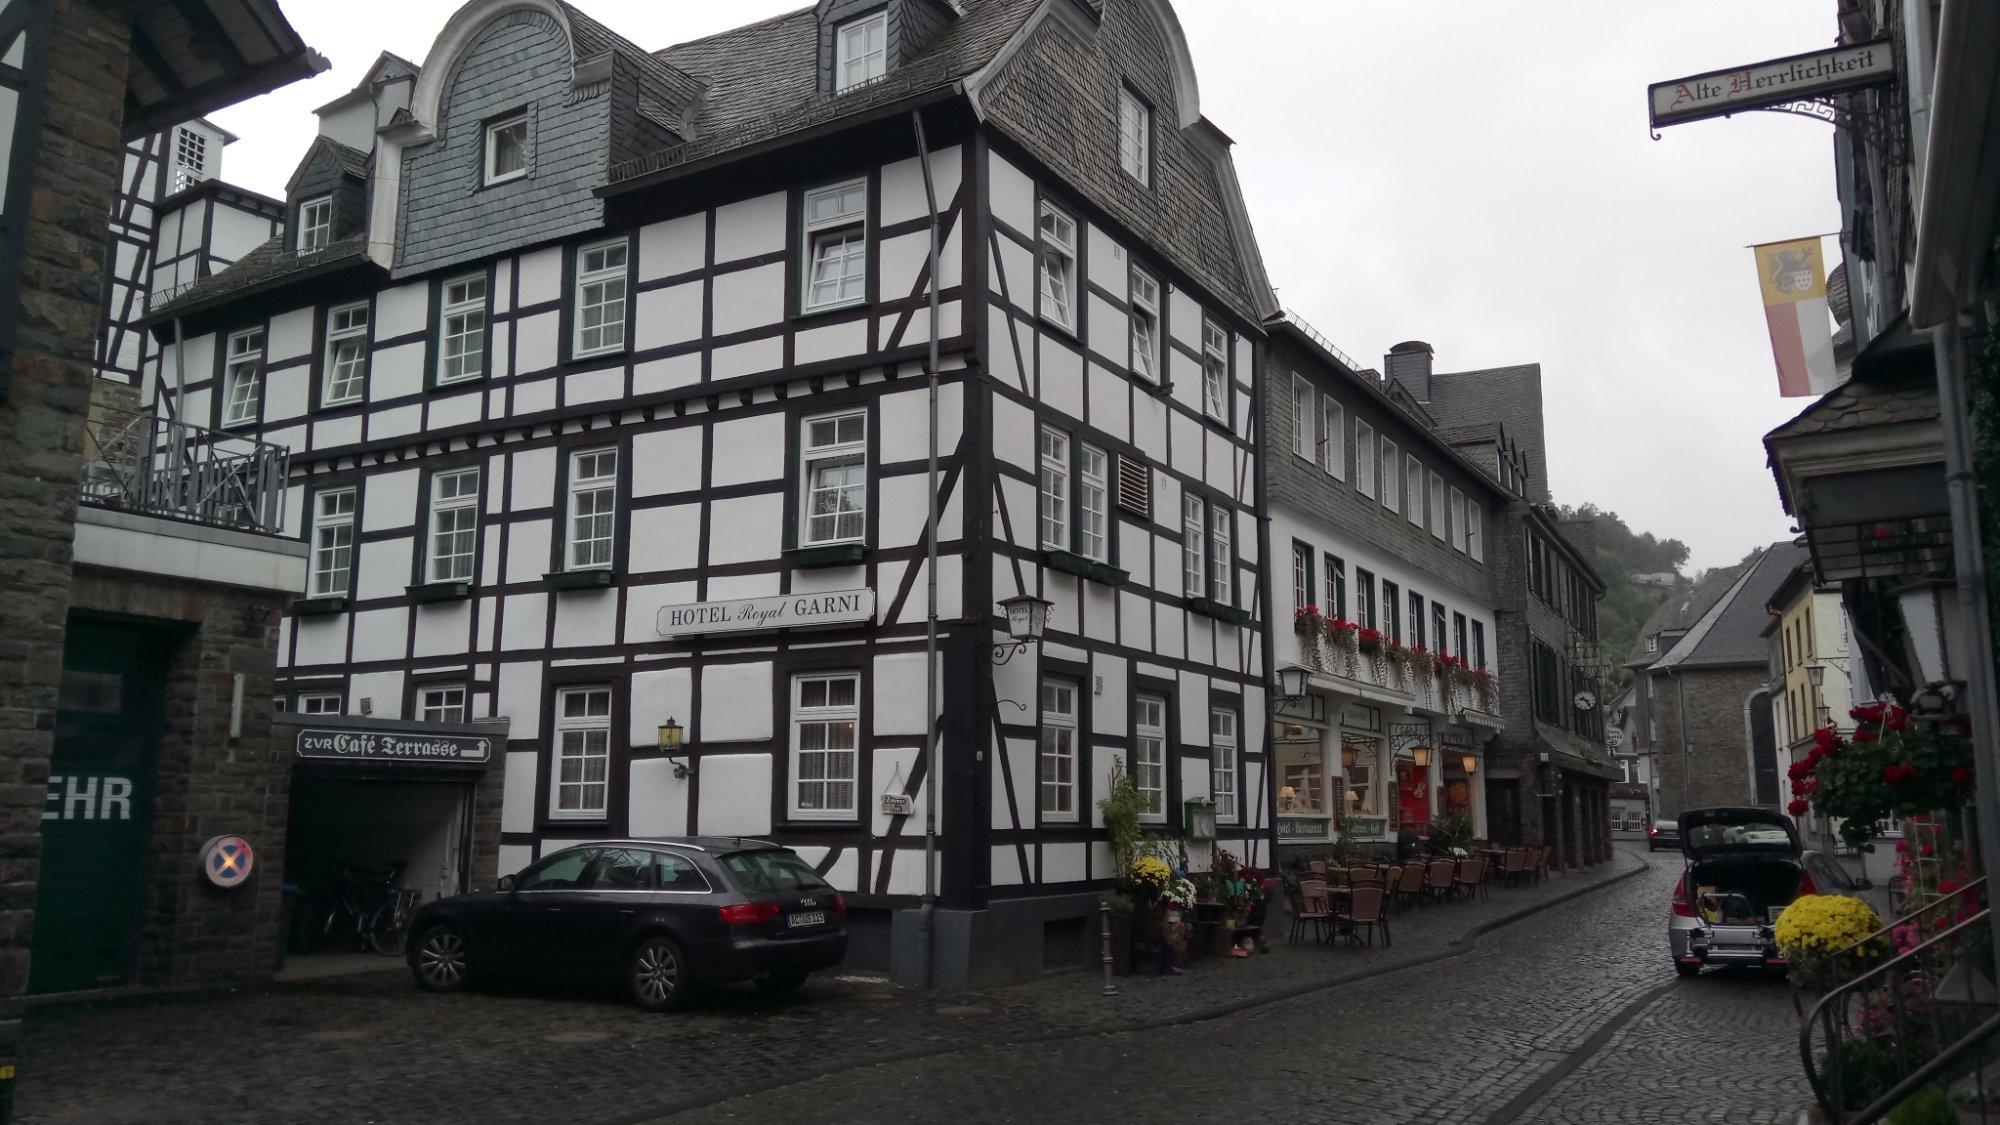 Hotel Royal und Schloss-Cafe